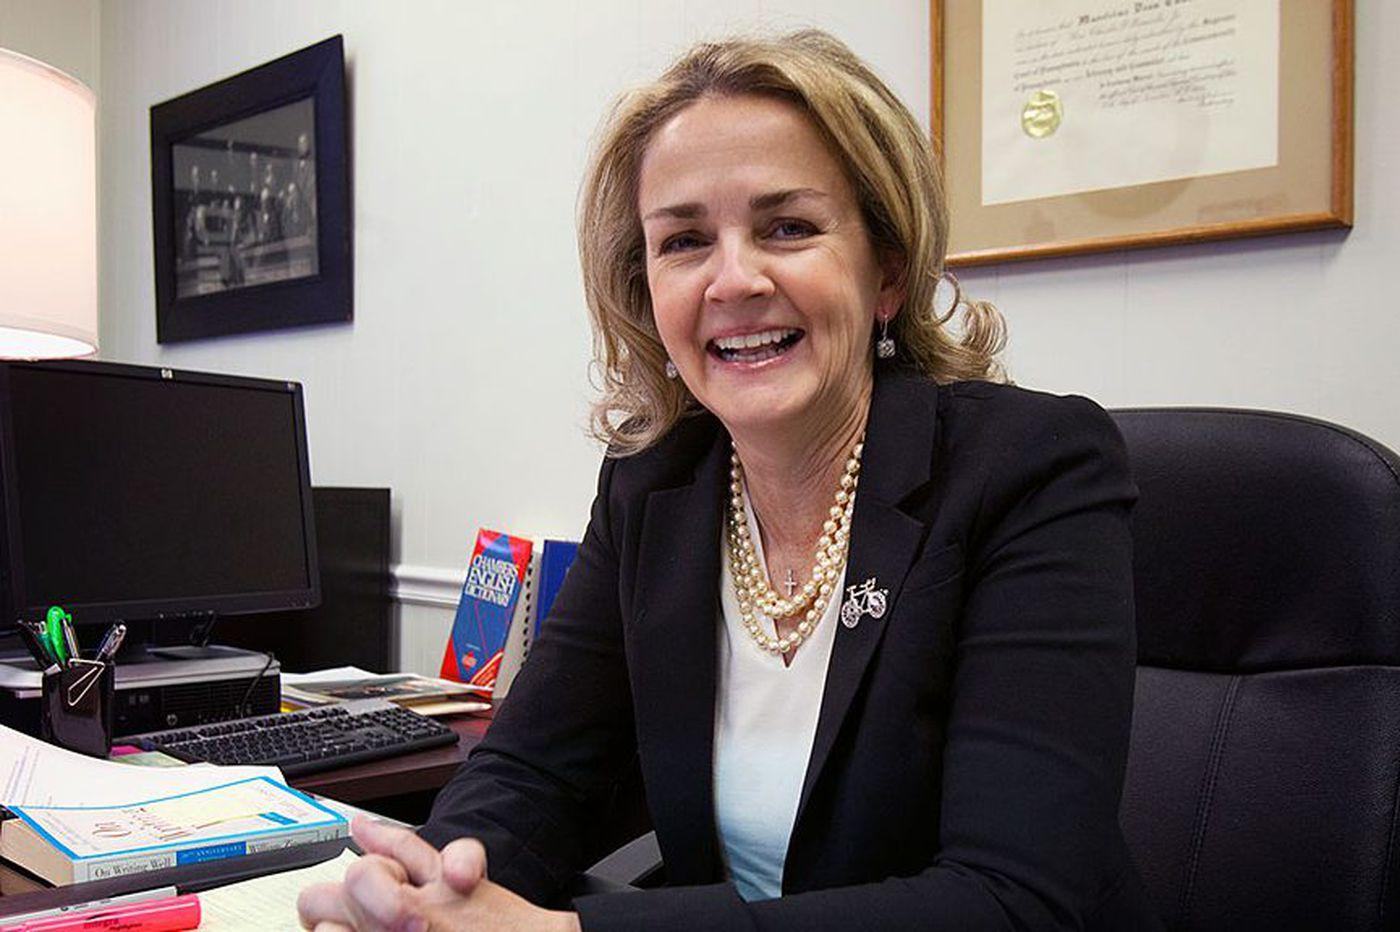 Madeleine Dean best Democrat for Pa.'s 4th Congressional District | Endorsement